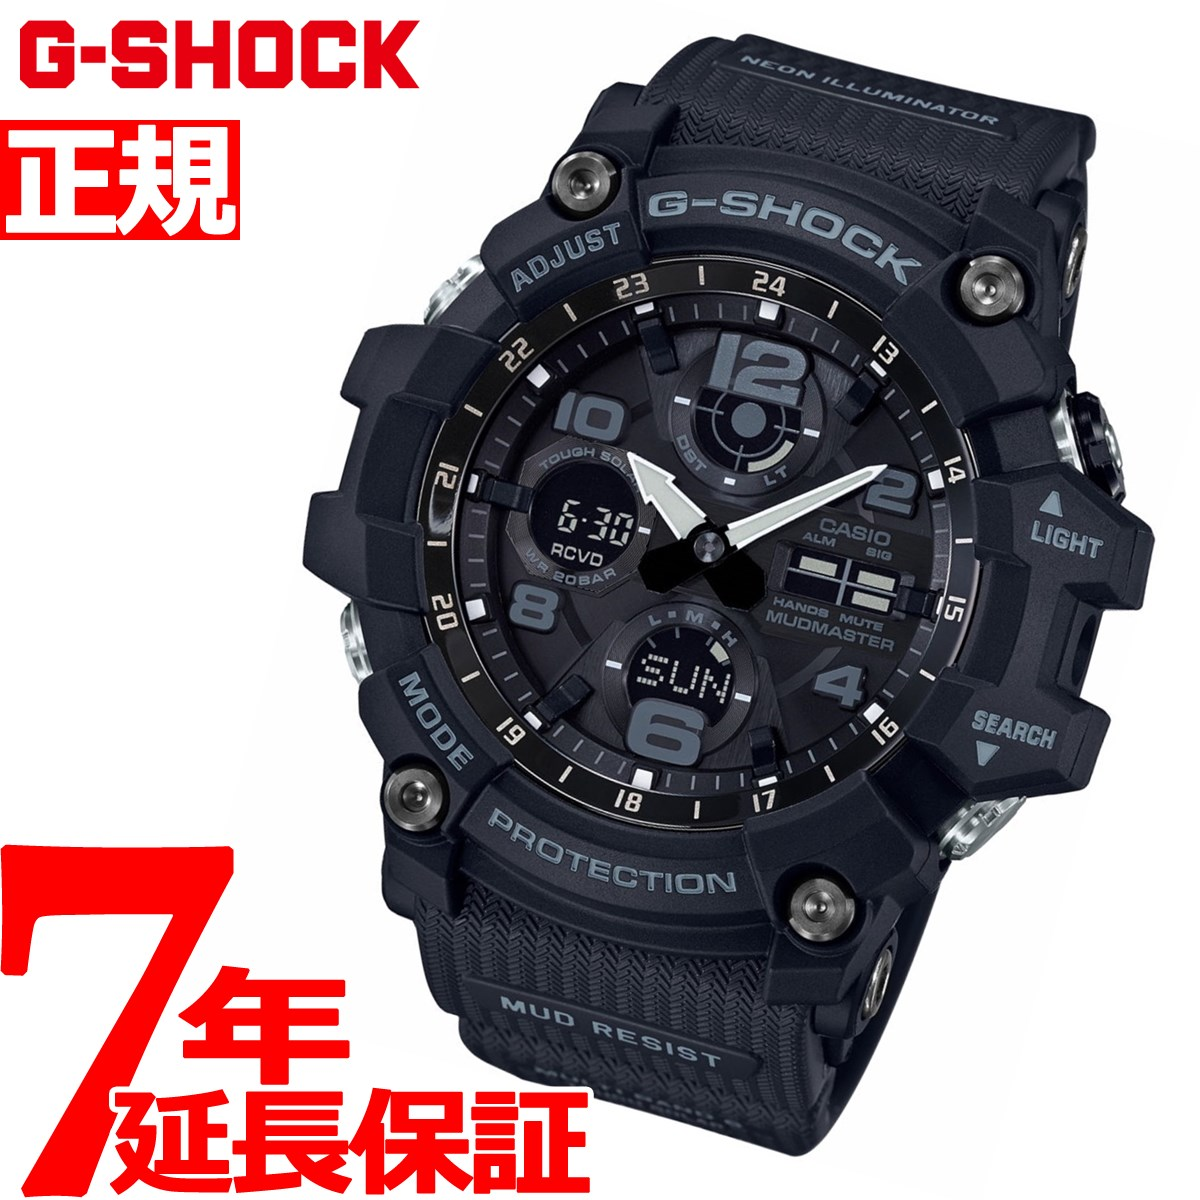 G-SHOCK 電波 ソーラー 電波時計 カシオ Gショック マッドマスター MUDMASTER 腕時計 メンズ MASTER OF G GWG-100-1AJF【2018 新作】